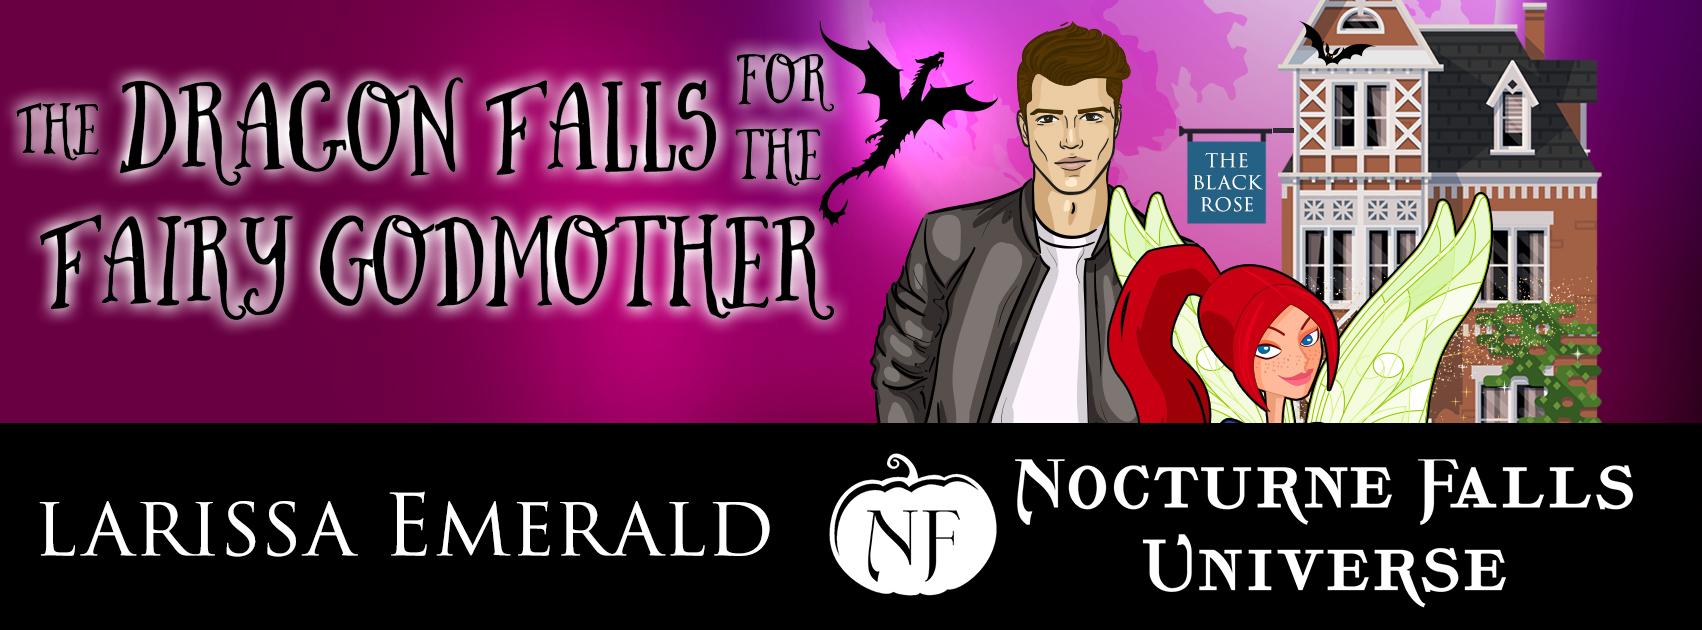 Nocturne Falls Universe